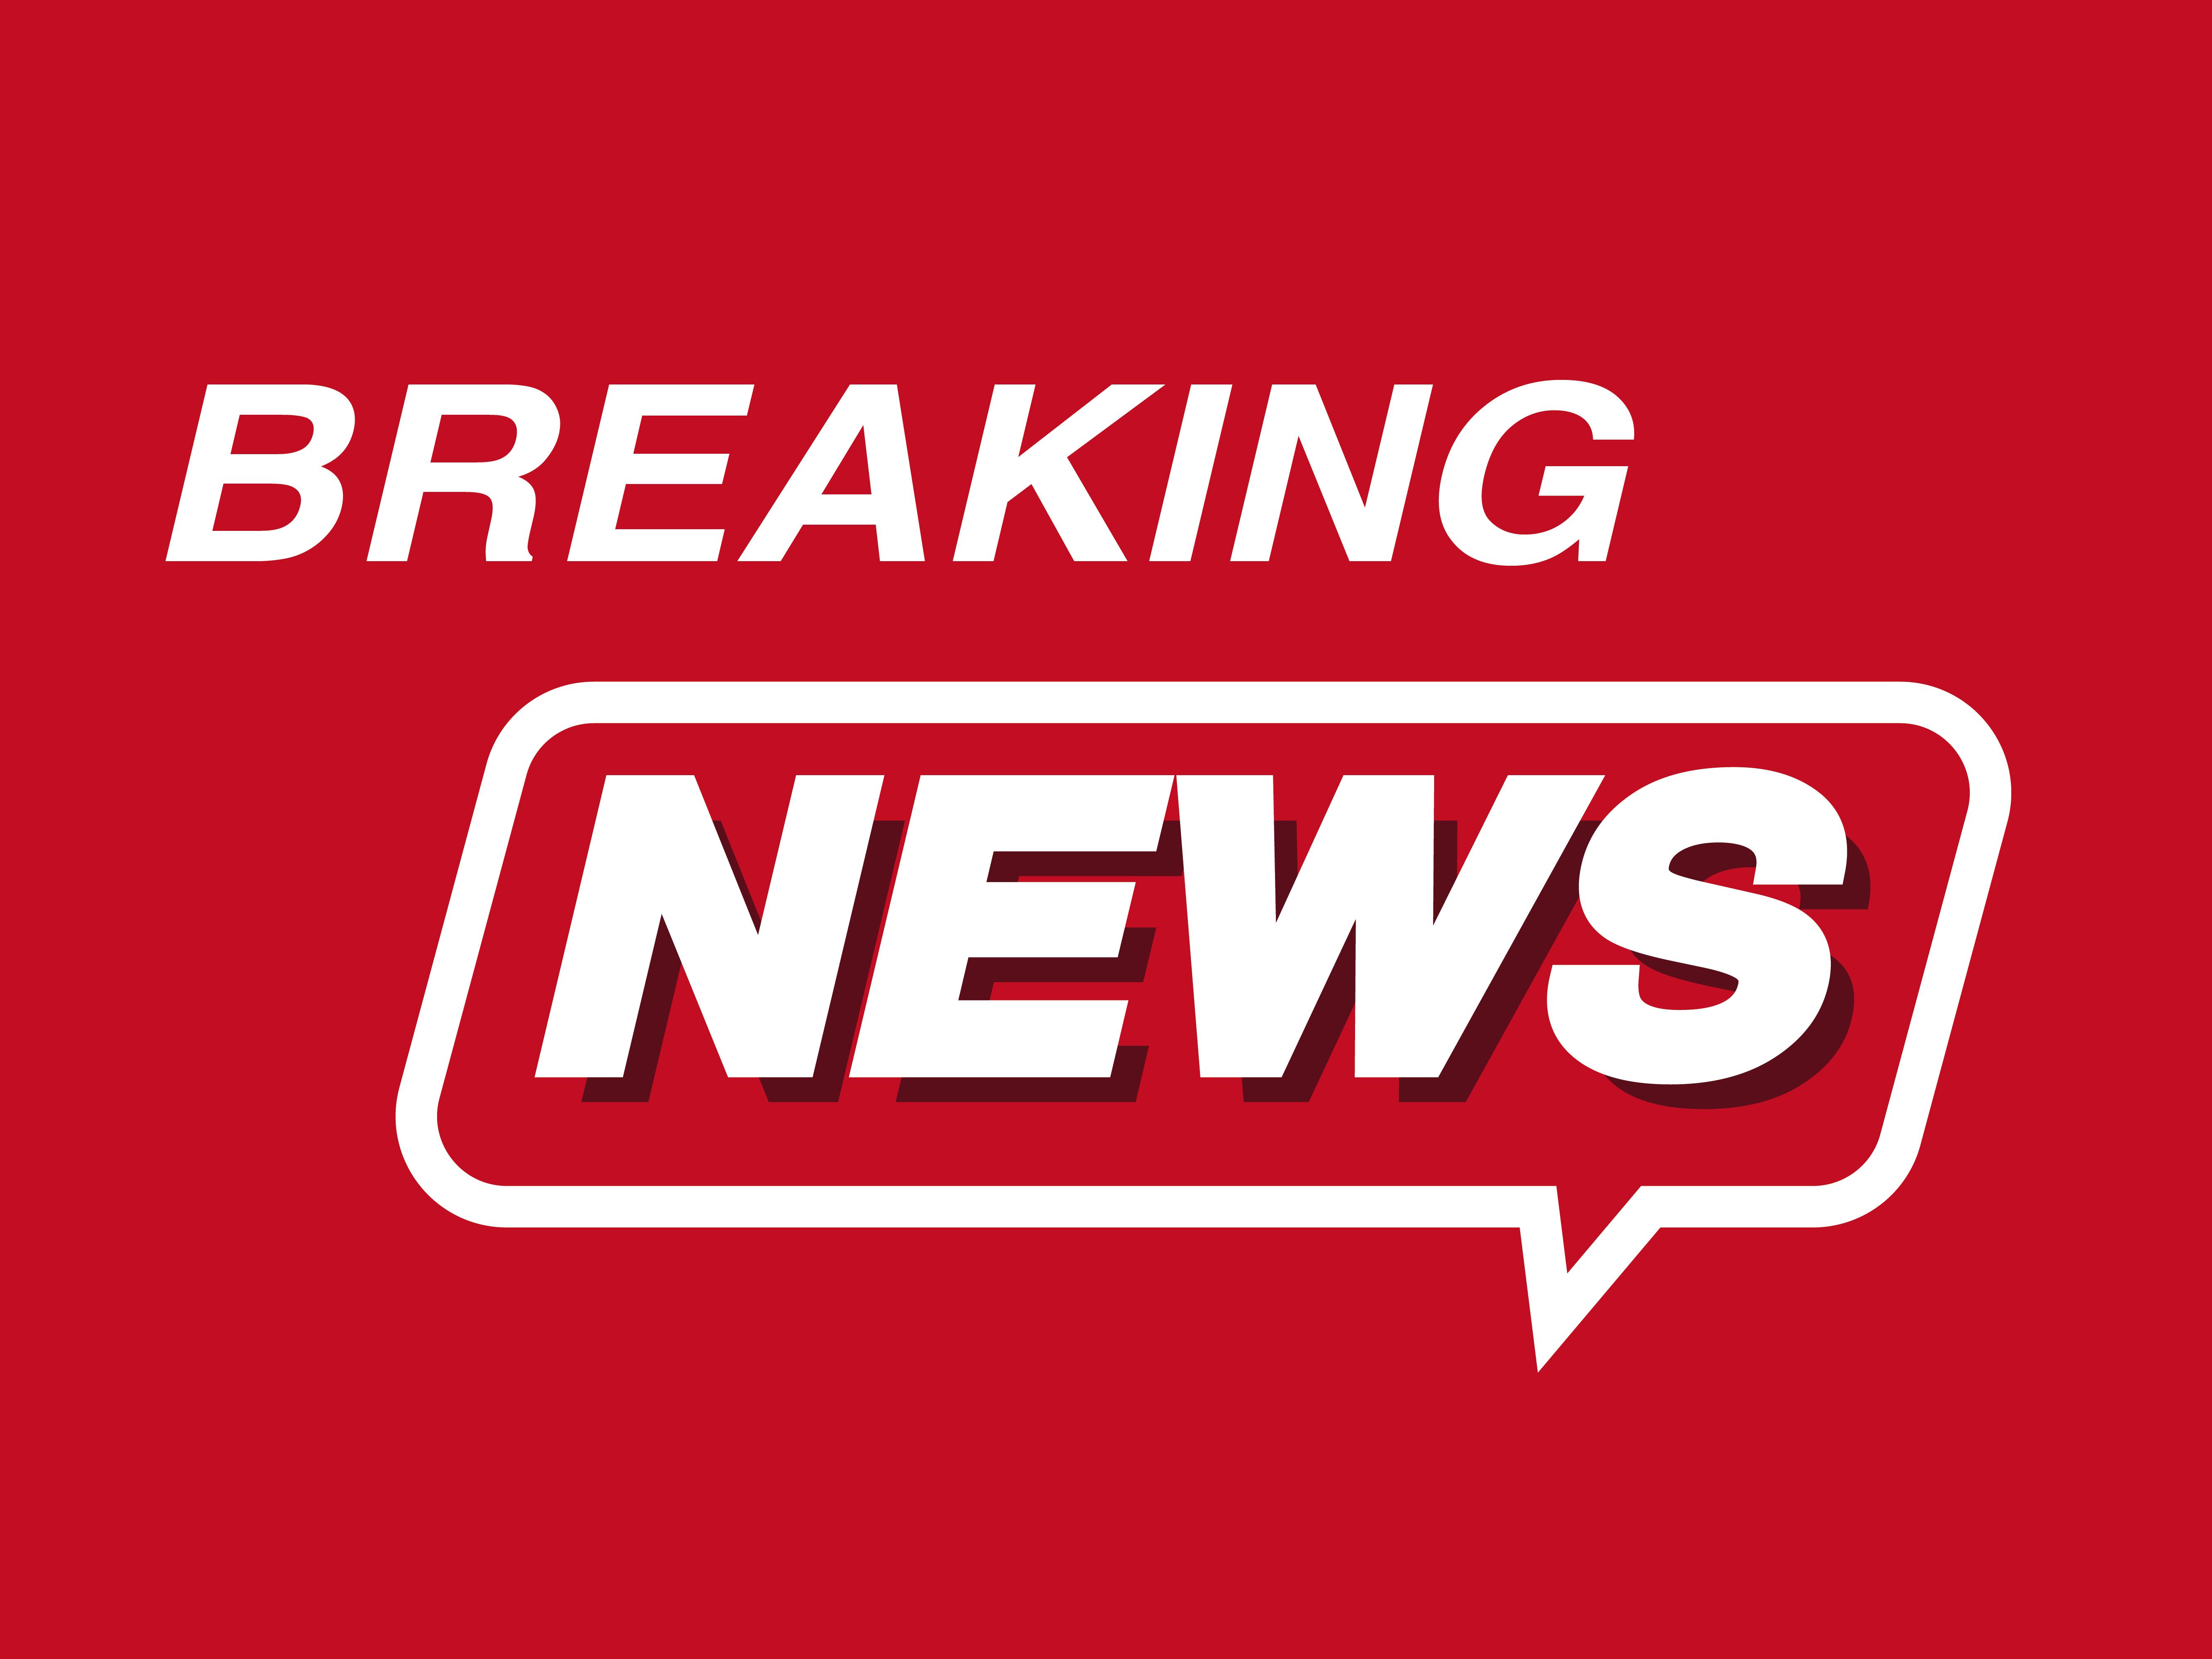 5.4-magnitude quake hits Croatia: USGS